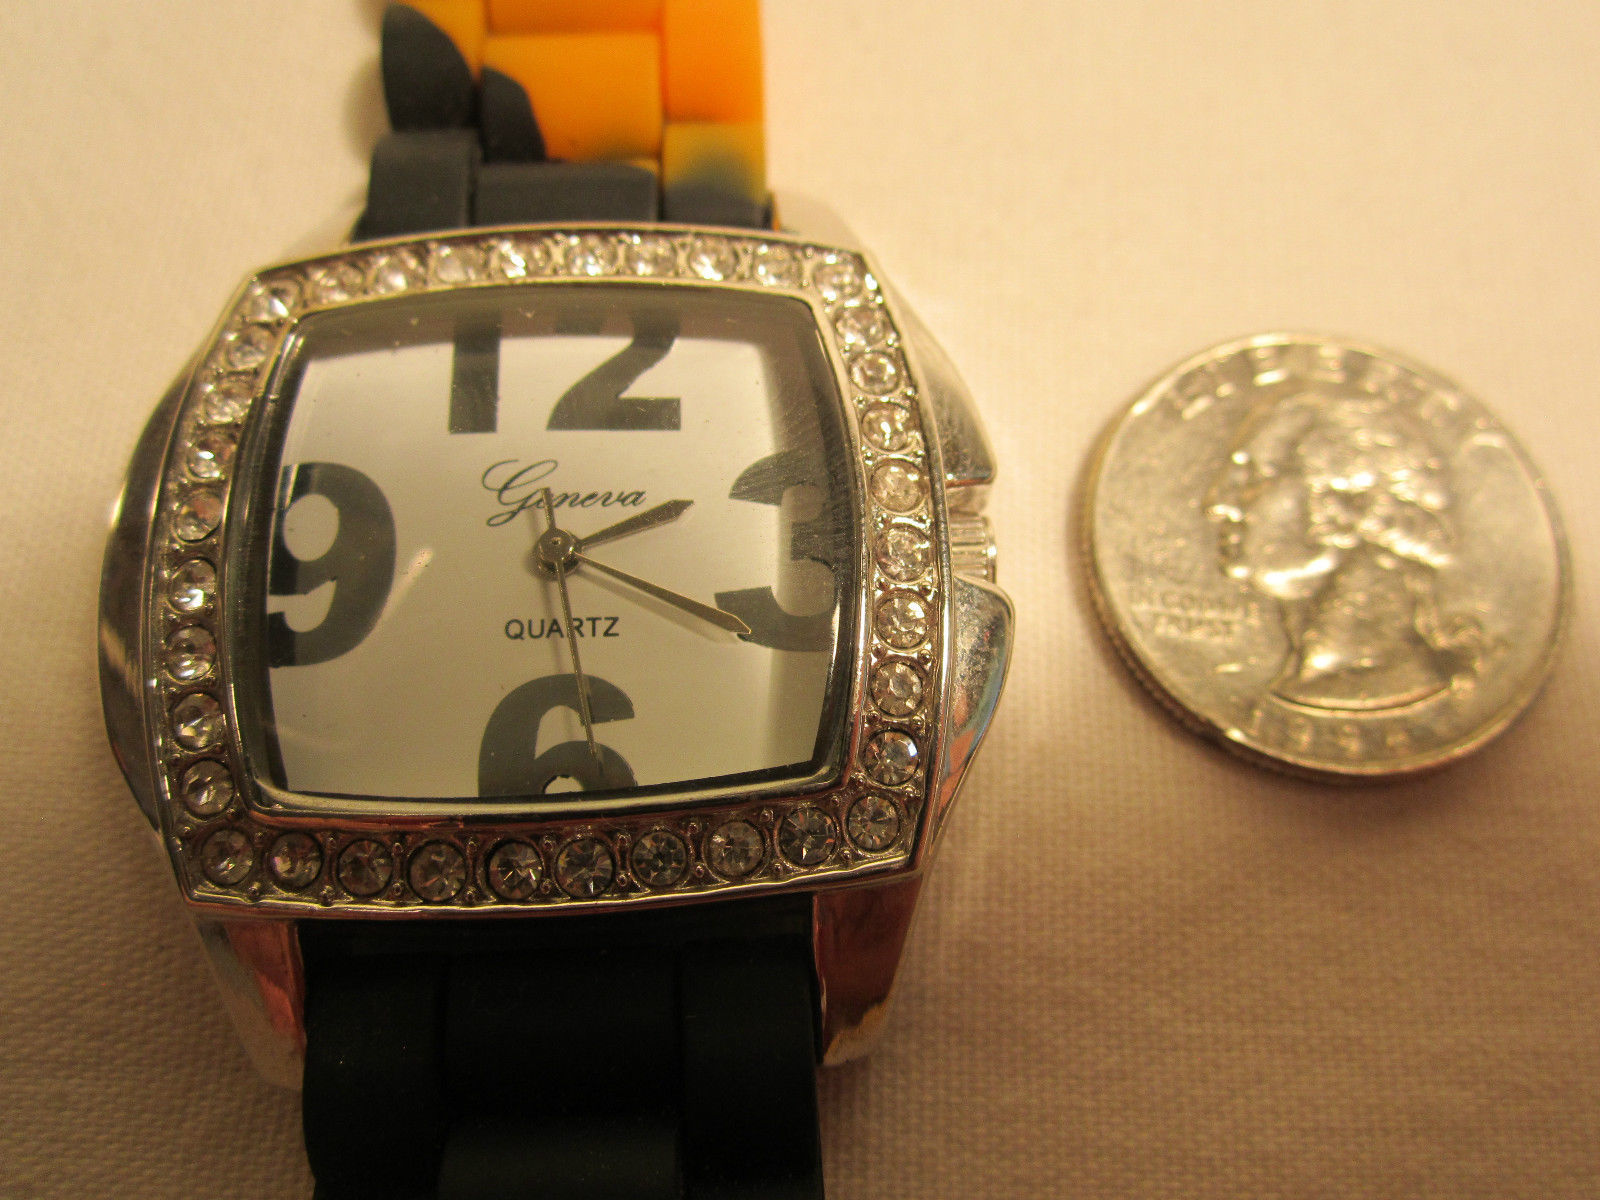 *Working* Electric ANALOG Women's Wristwatch GENEVA QUARTZ [h12c1]